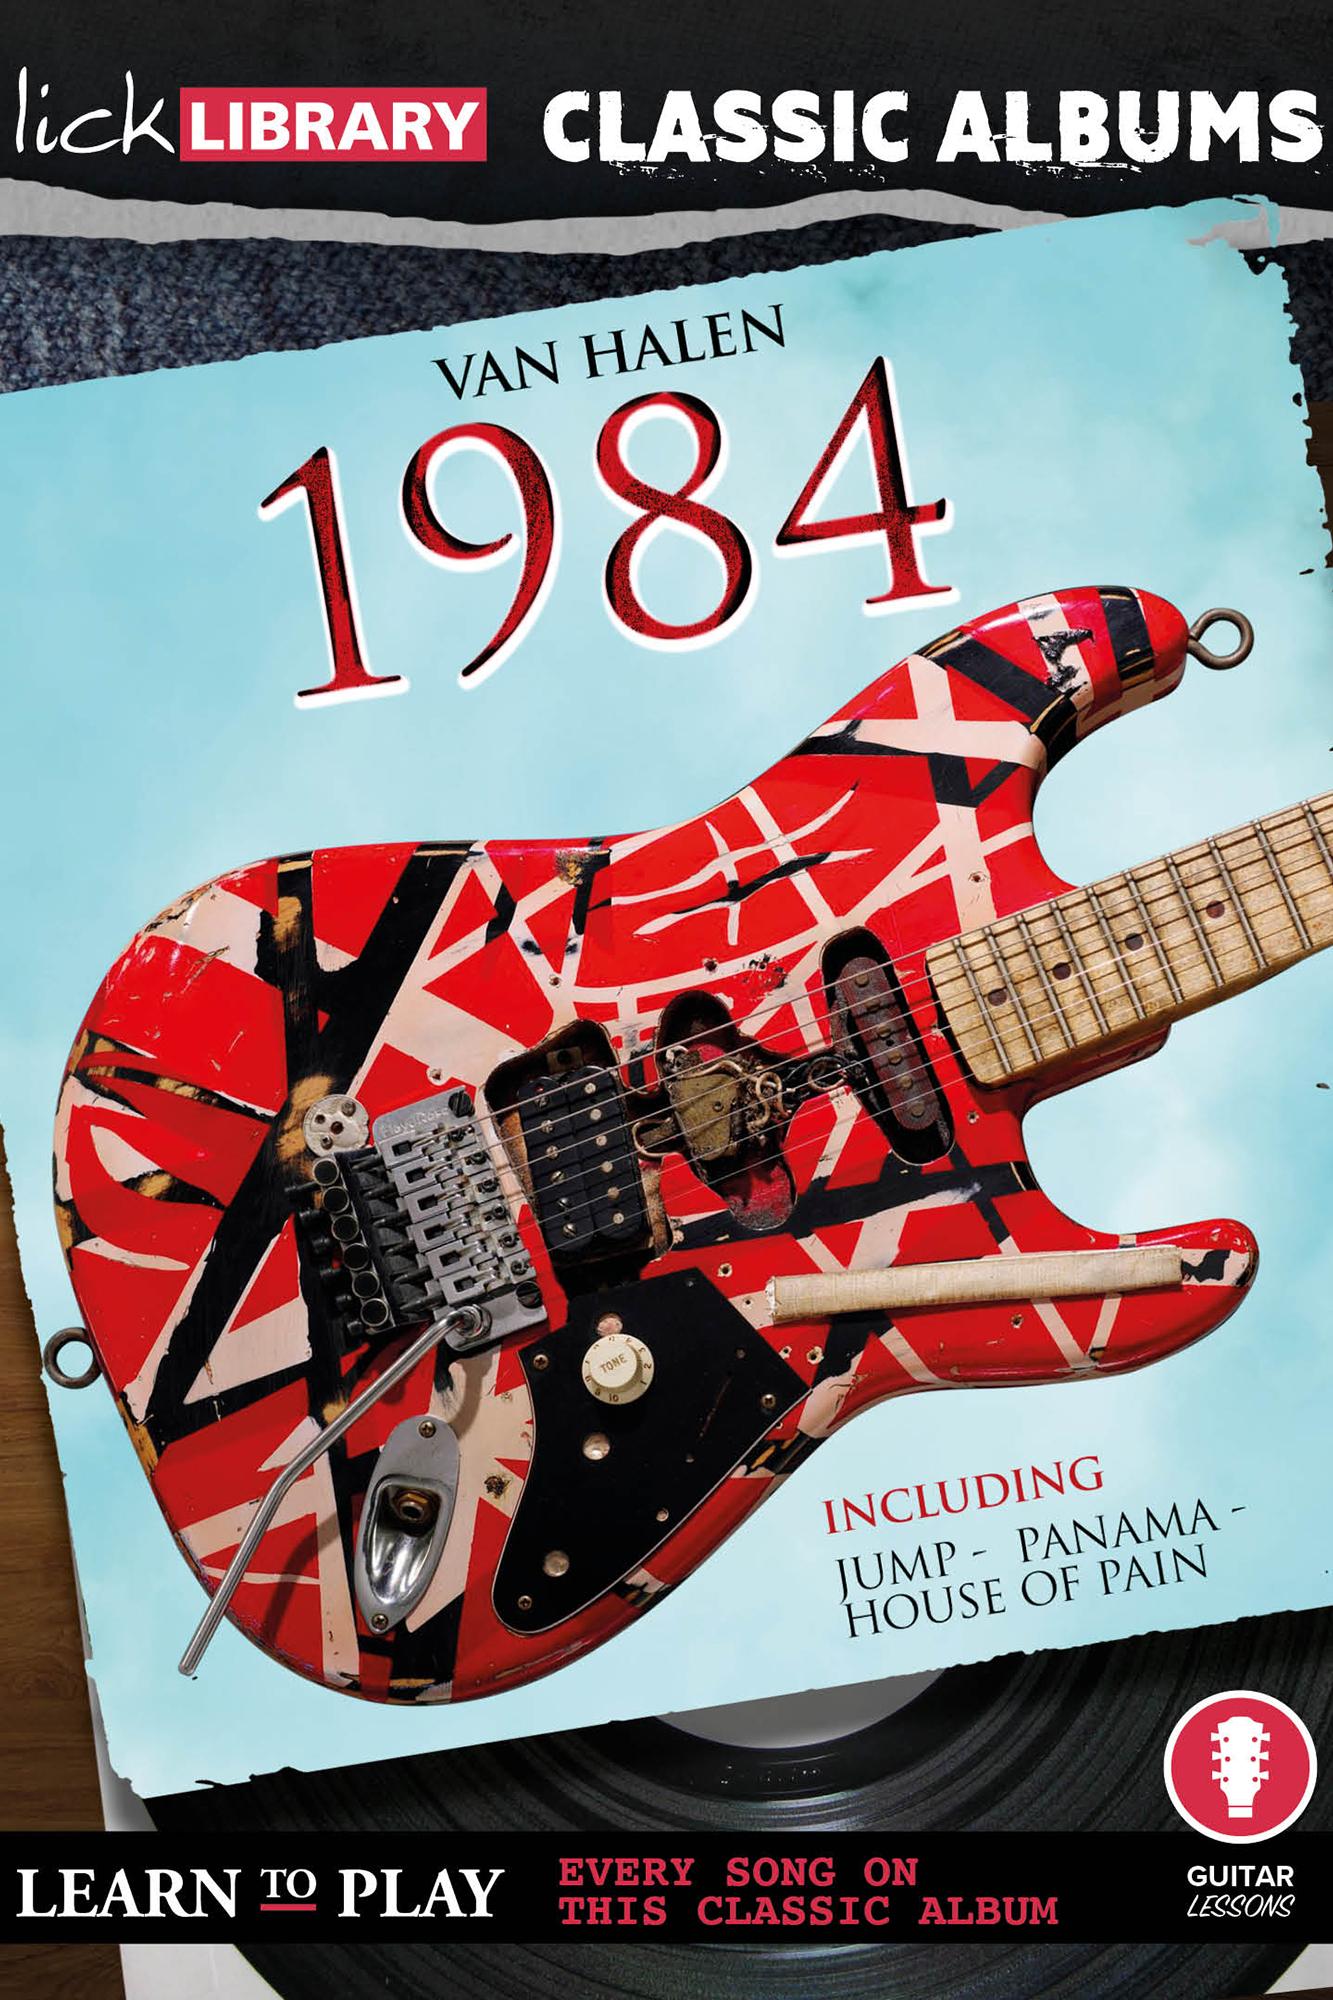 Classic Albums Van Halen 1984 Store Licklibrary